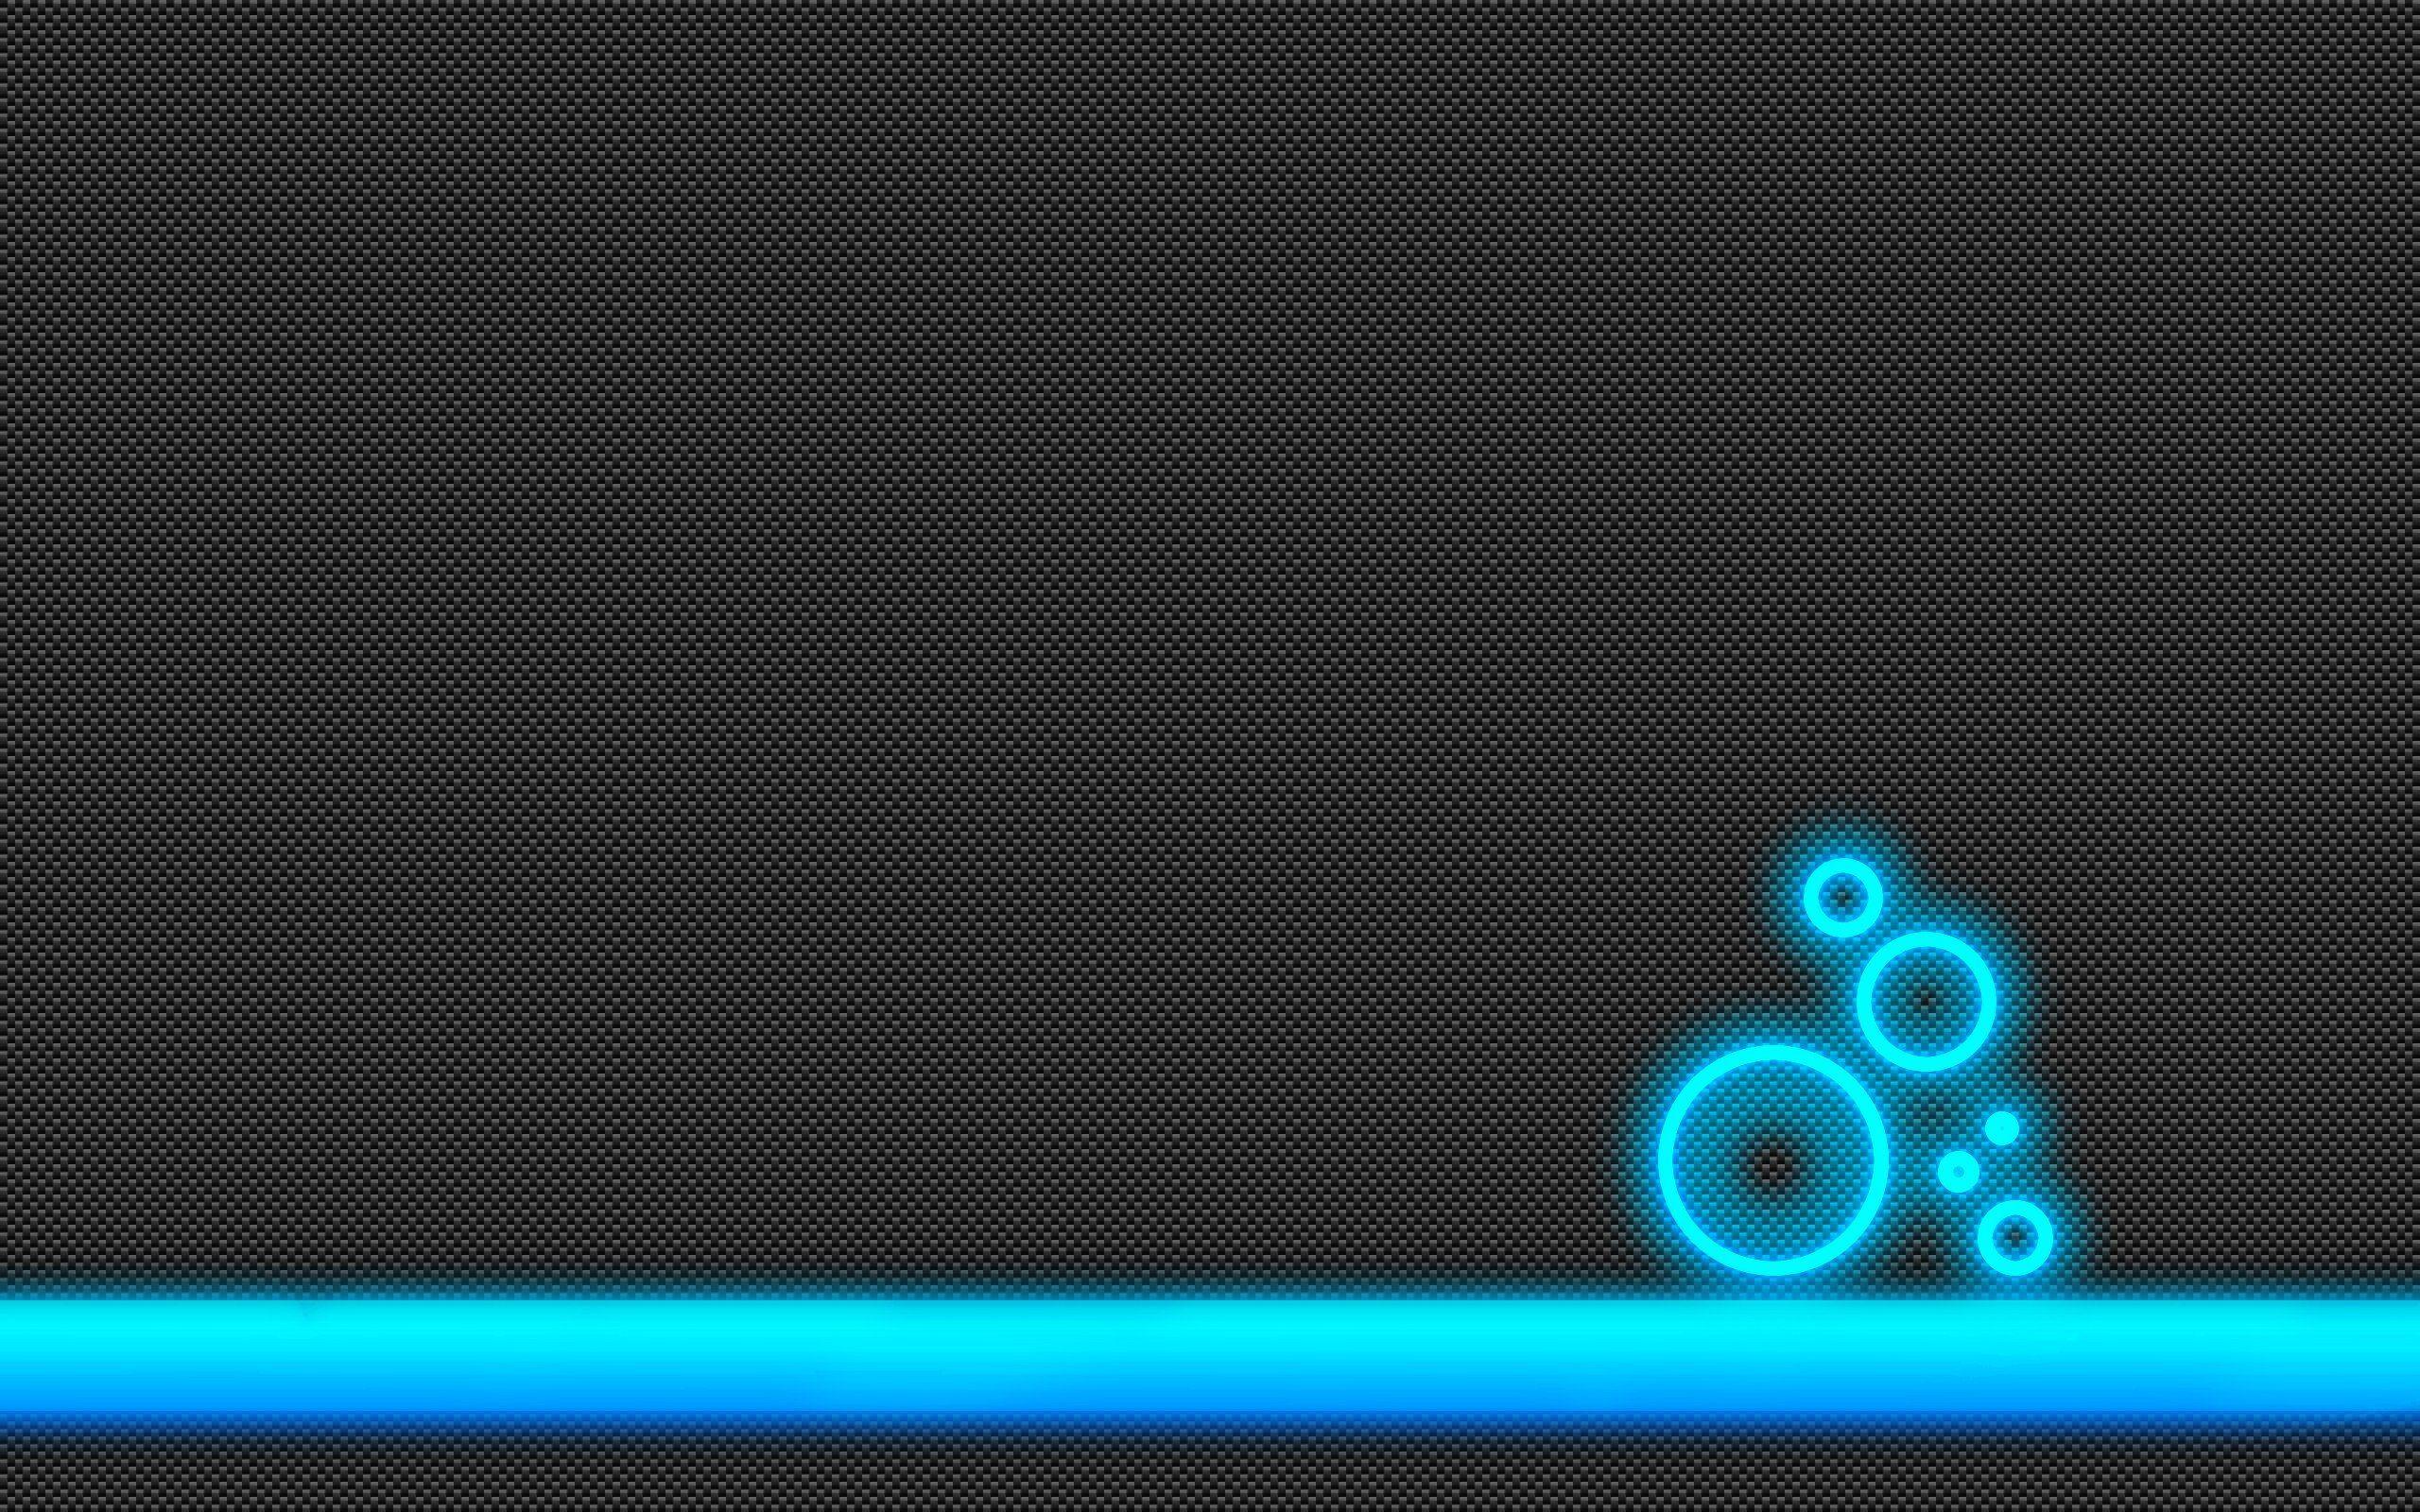 Neon Fall Wallpapers Blue Carbon Fiber Wallpaper Hd Pixelstalk Net